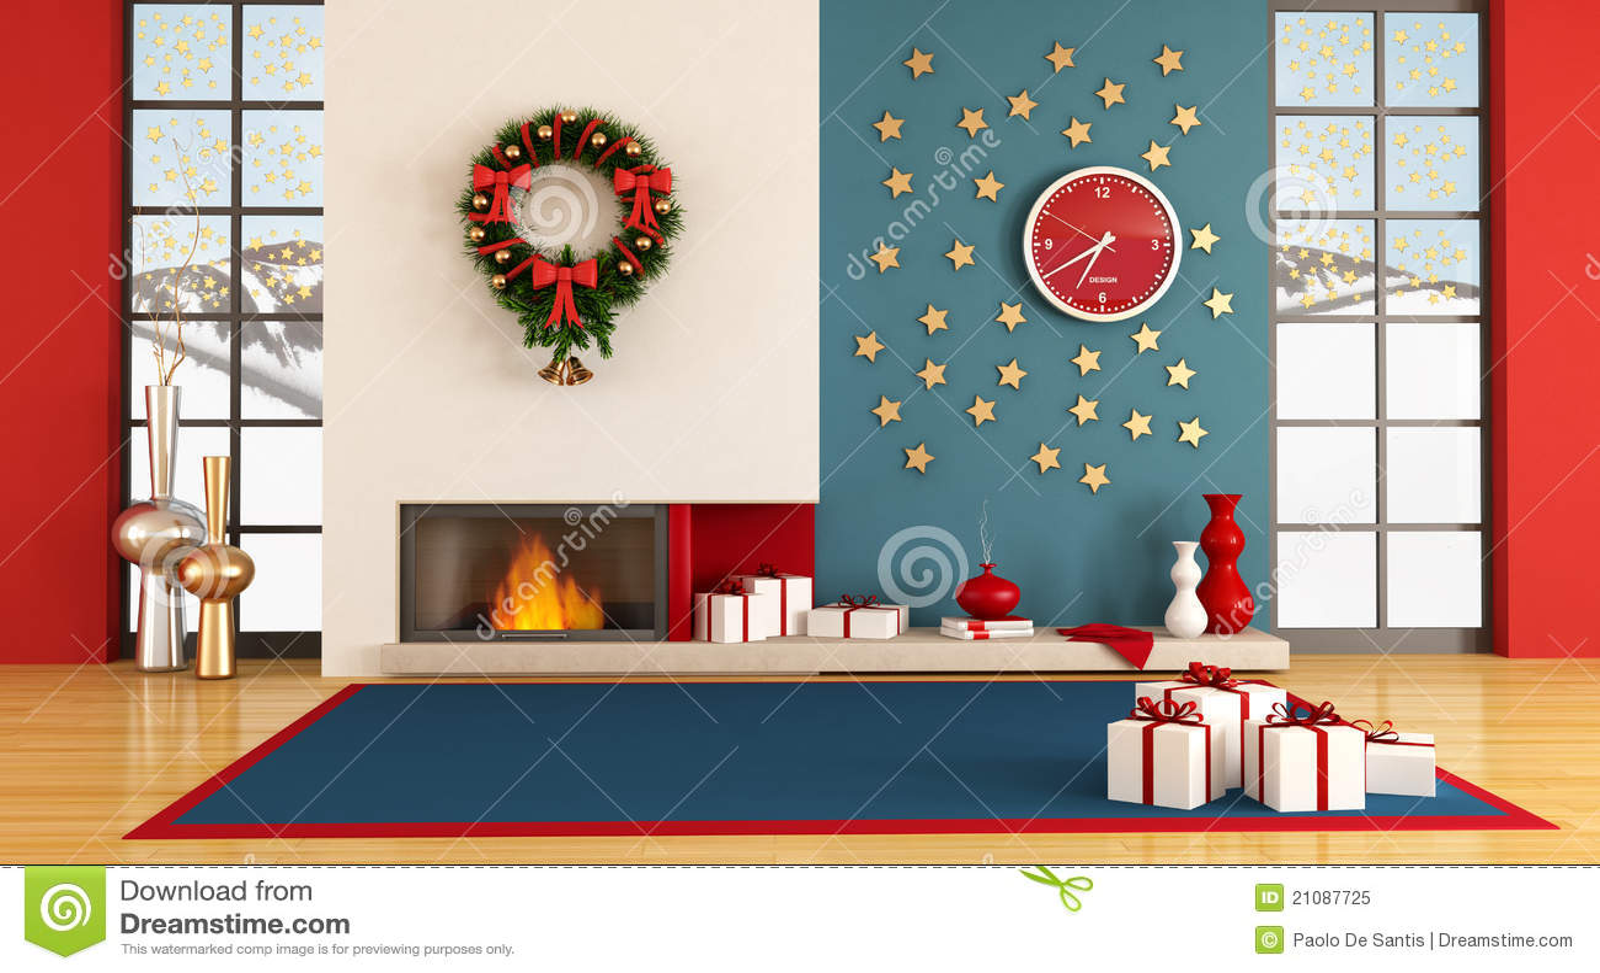 Decorate My Room Online Free: Modern Christmas Interior Stock Illustration. Illustration